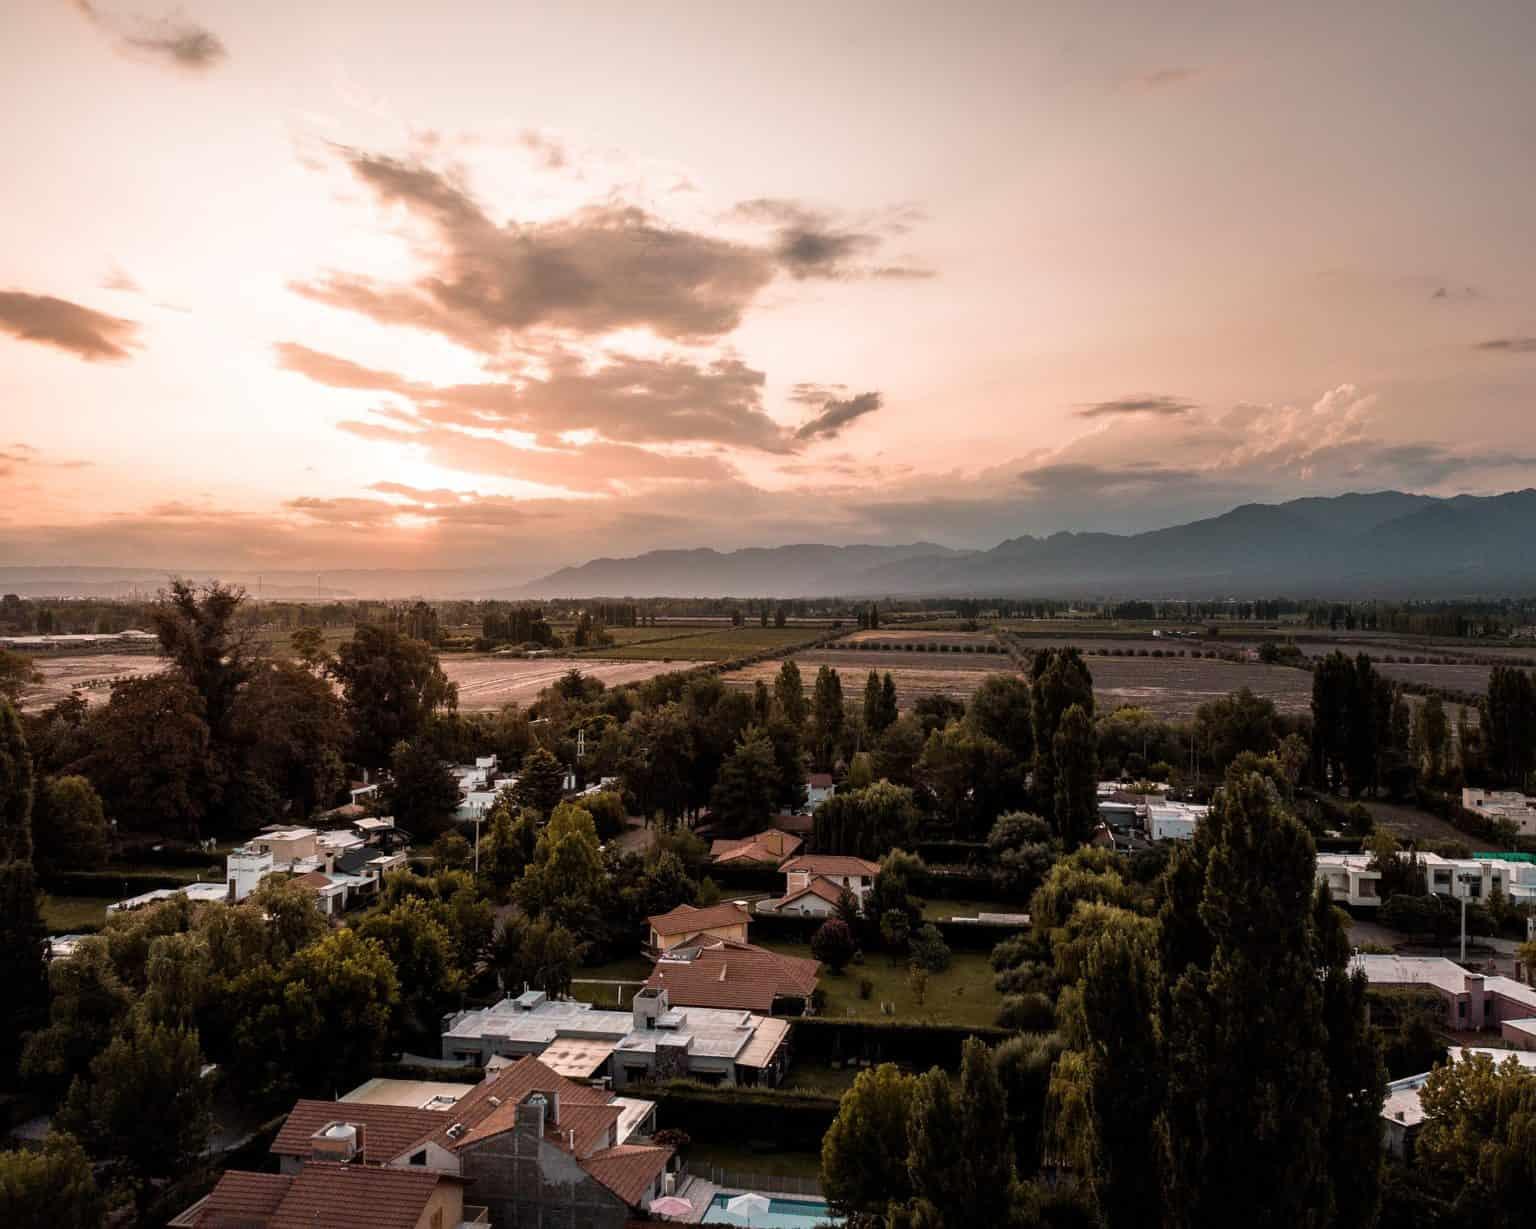 Walking tour in Mendoza